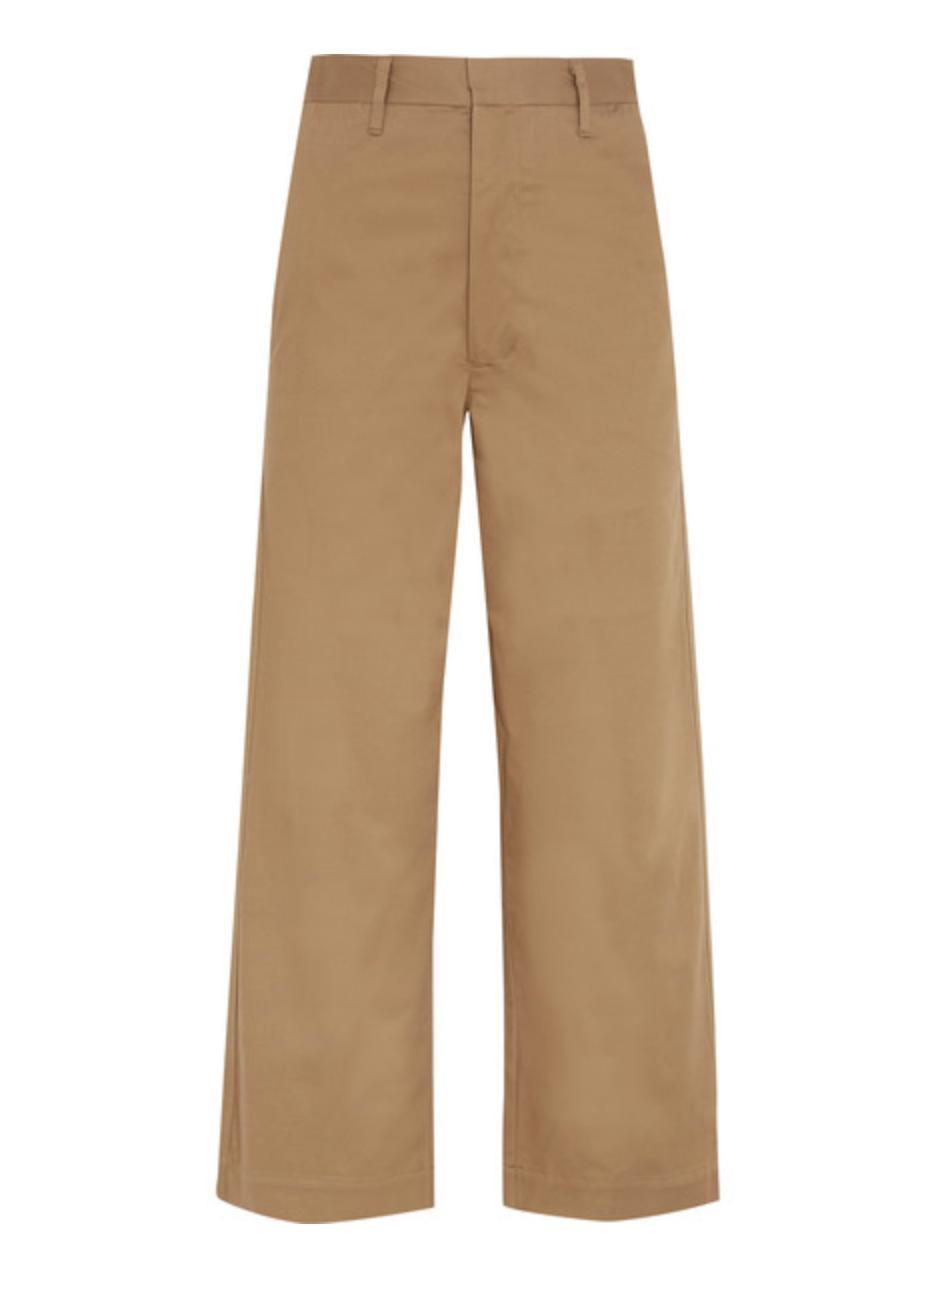 Bassike Pants, $320